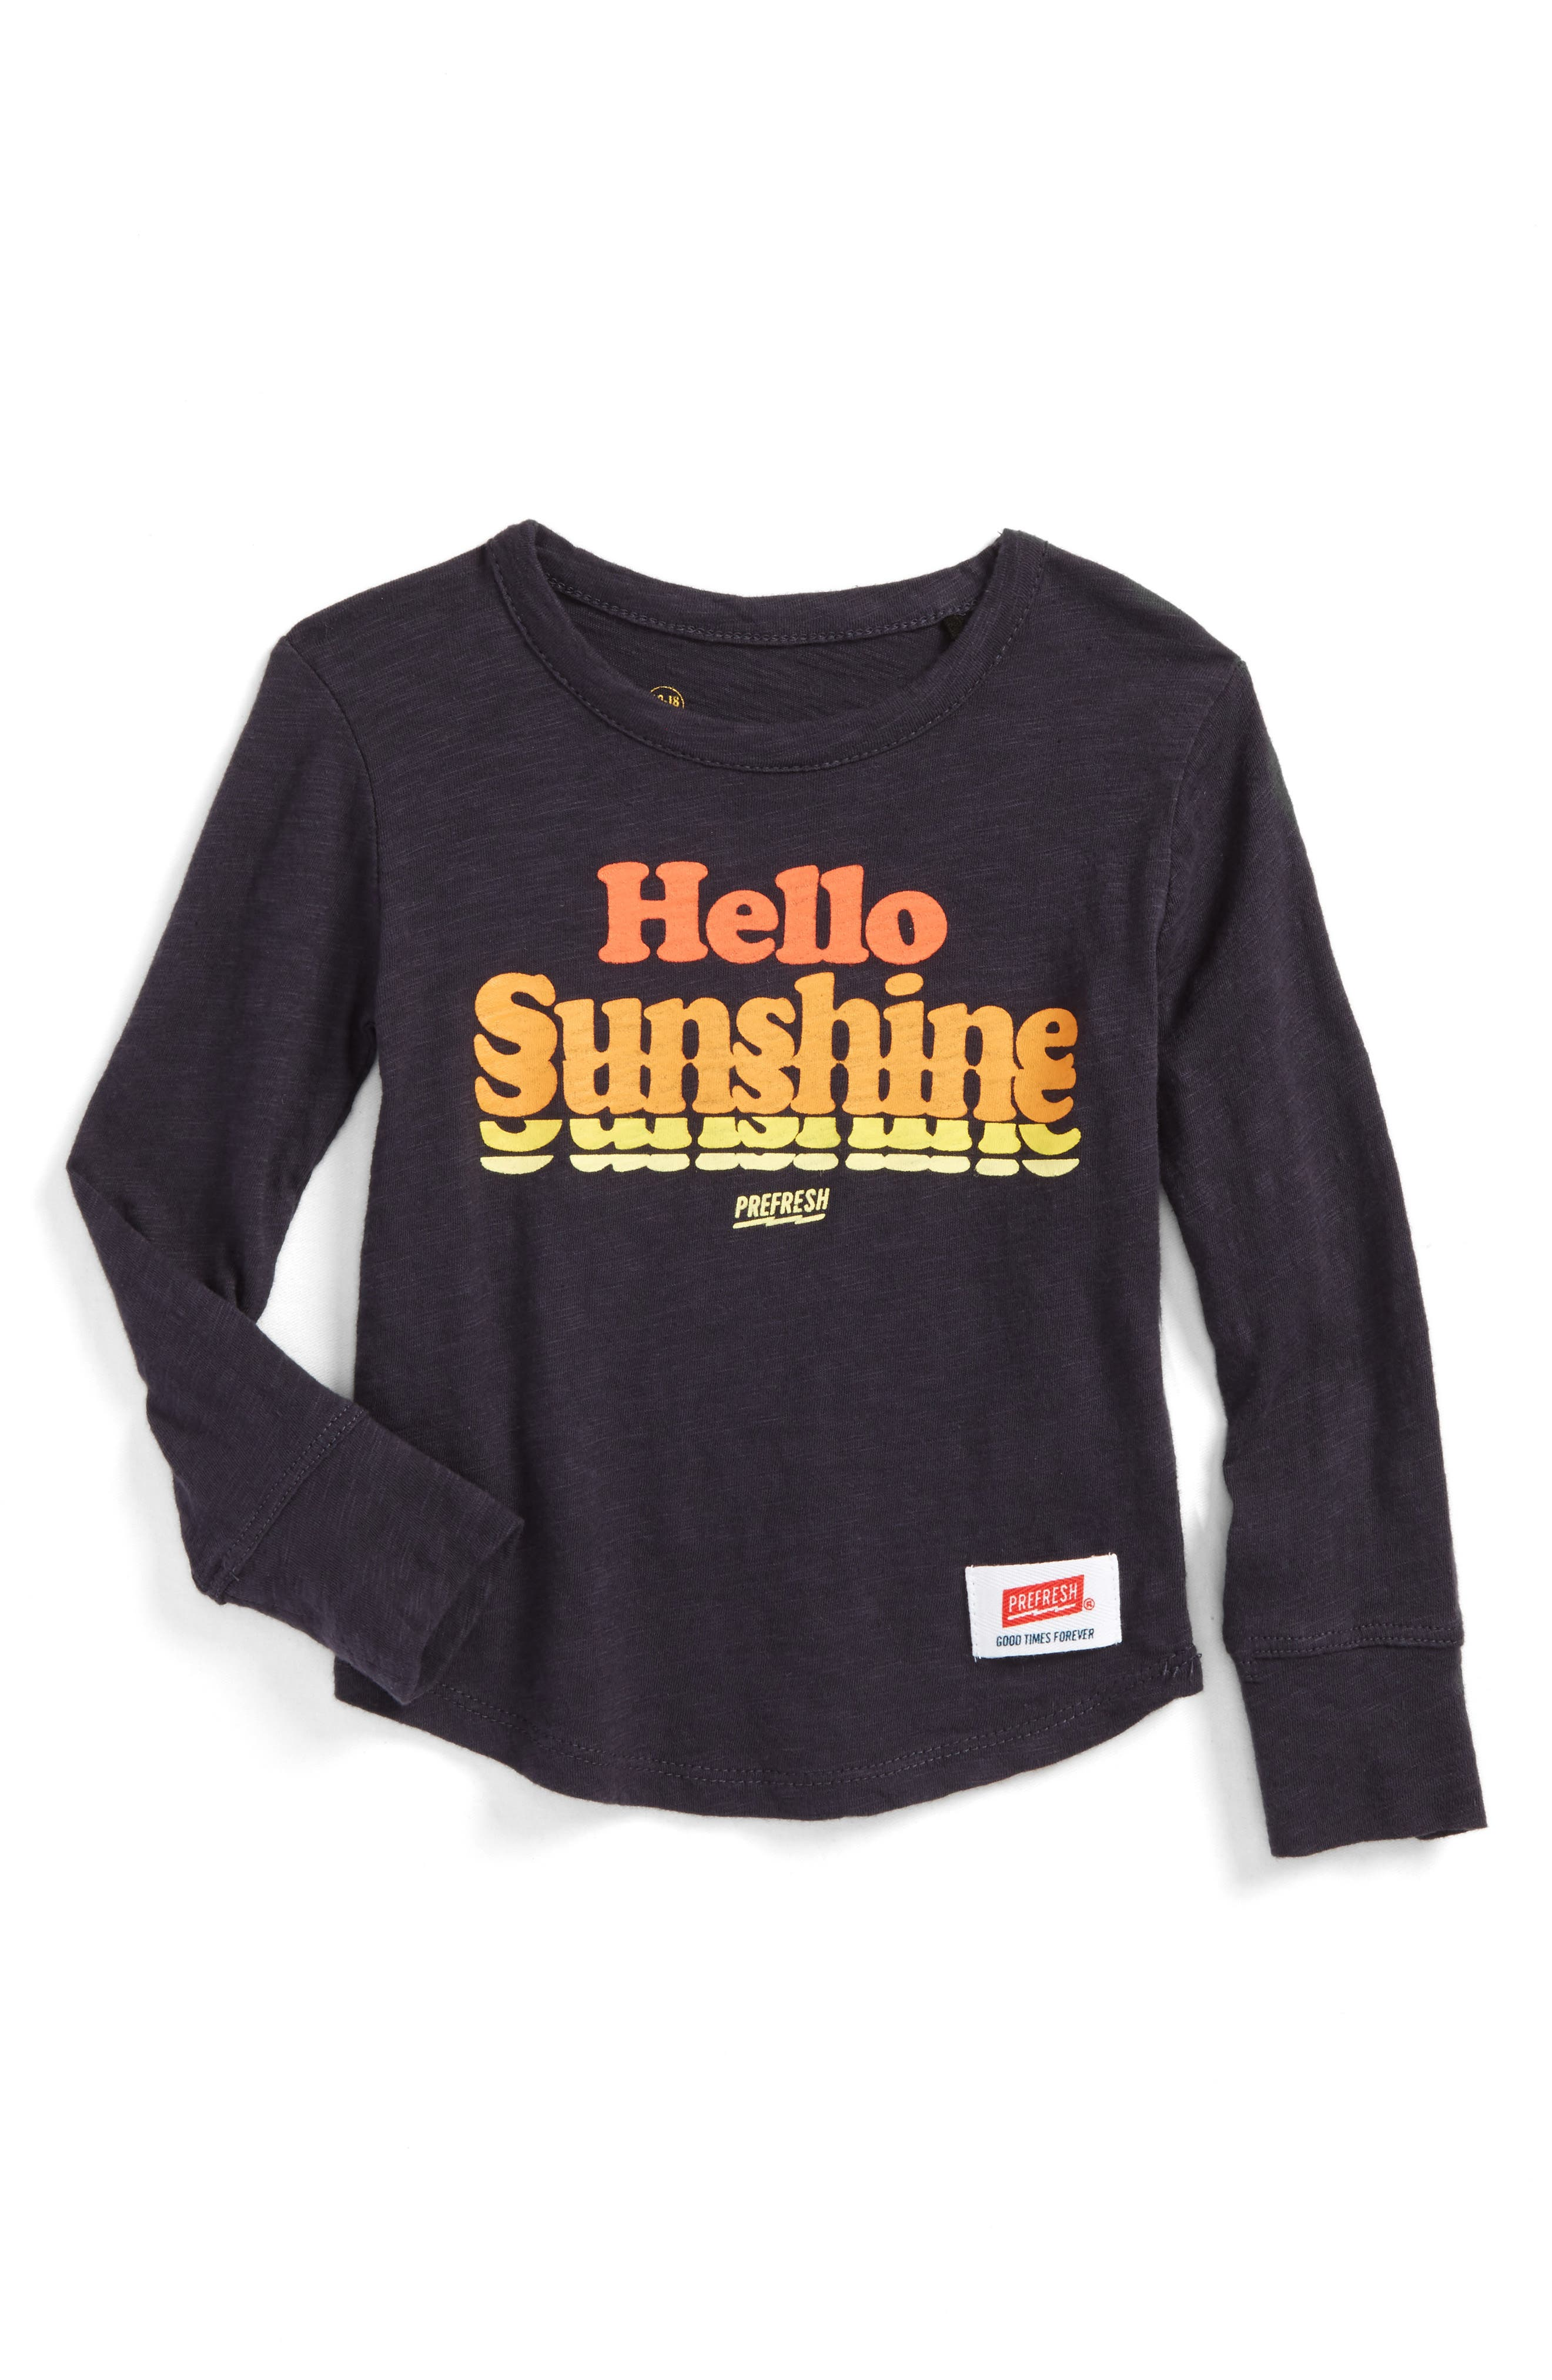 Prefresh Hello Sunshine Graphic T-Shirt (Baby Boys)